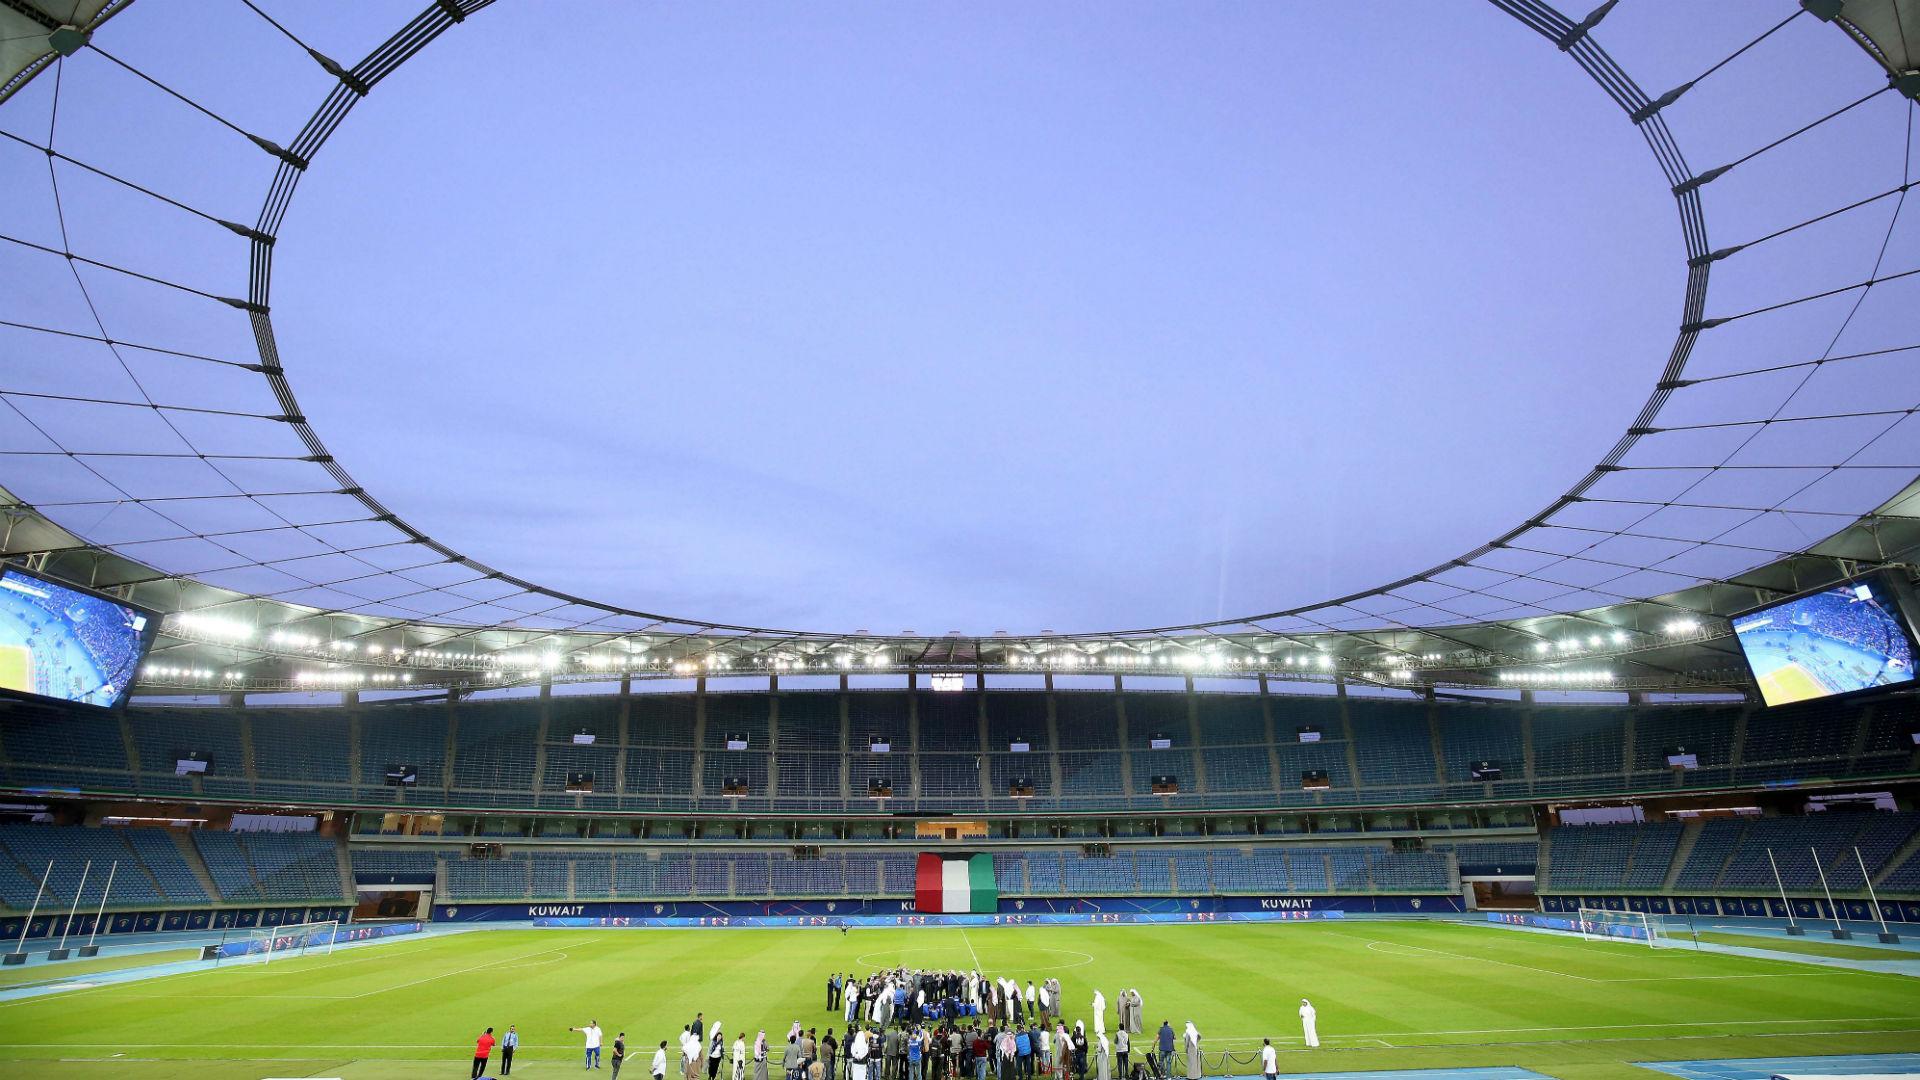 Jaber al-Ahmad International Stadium Kuwait general view